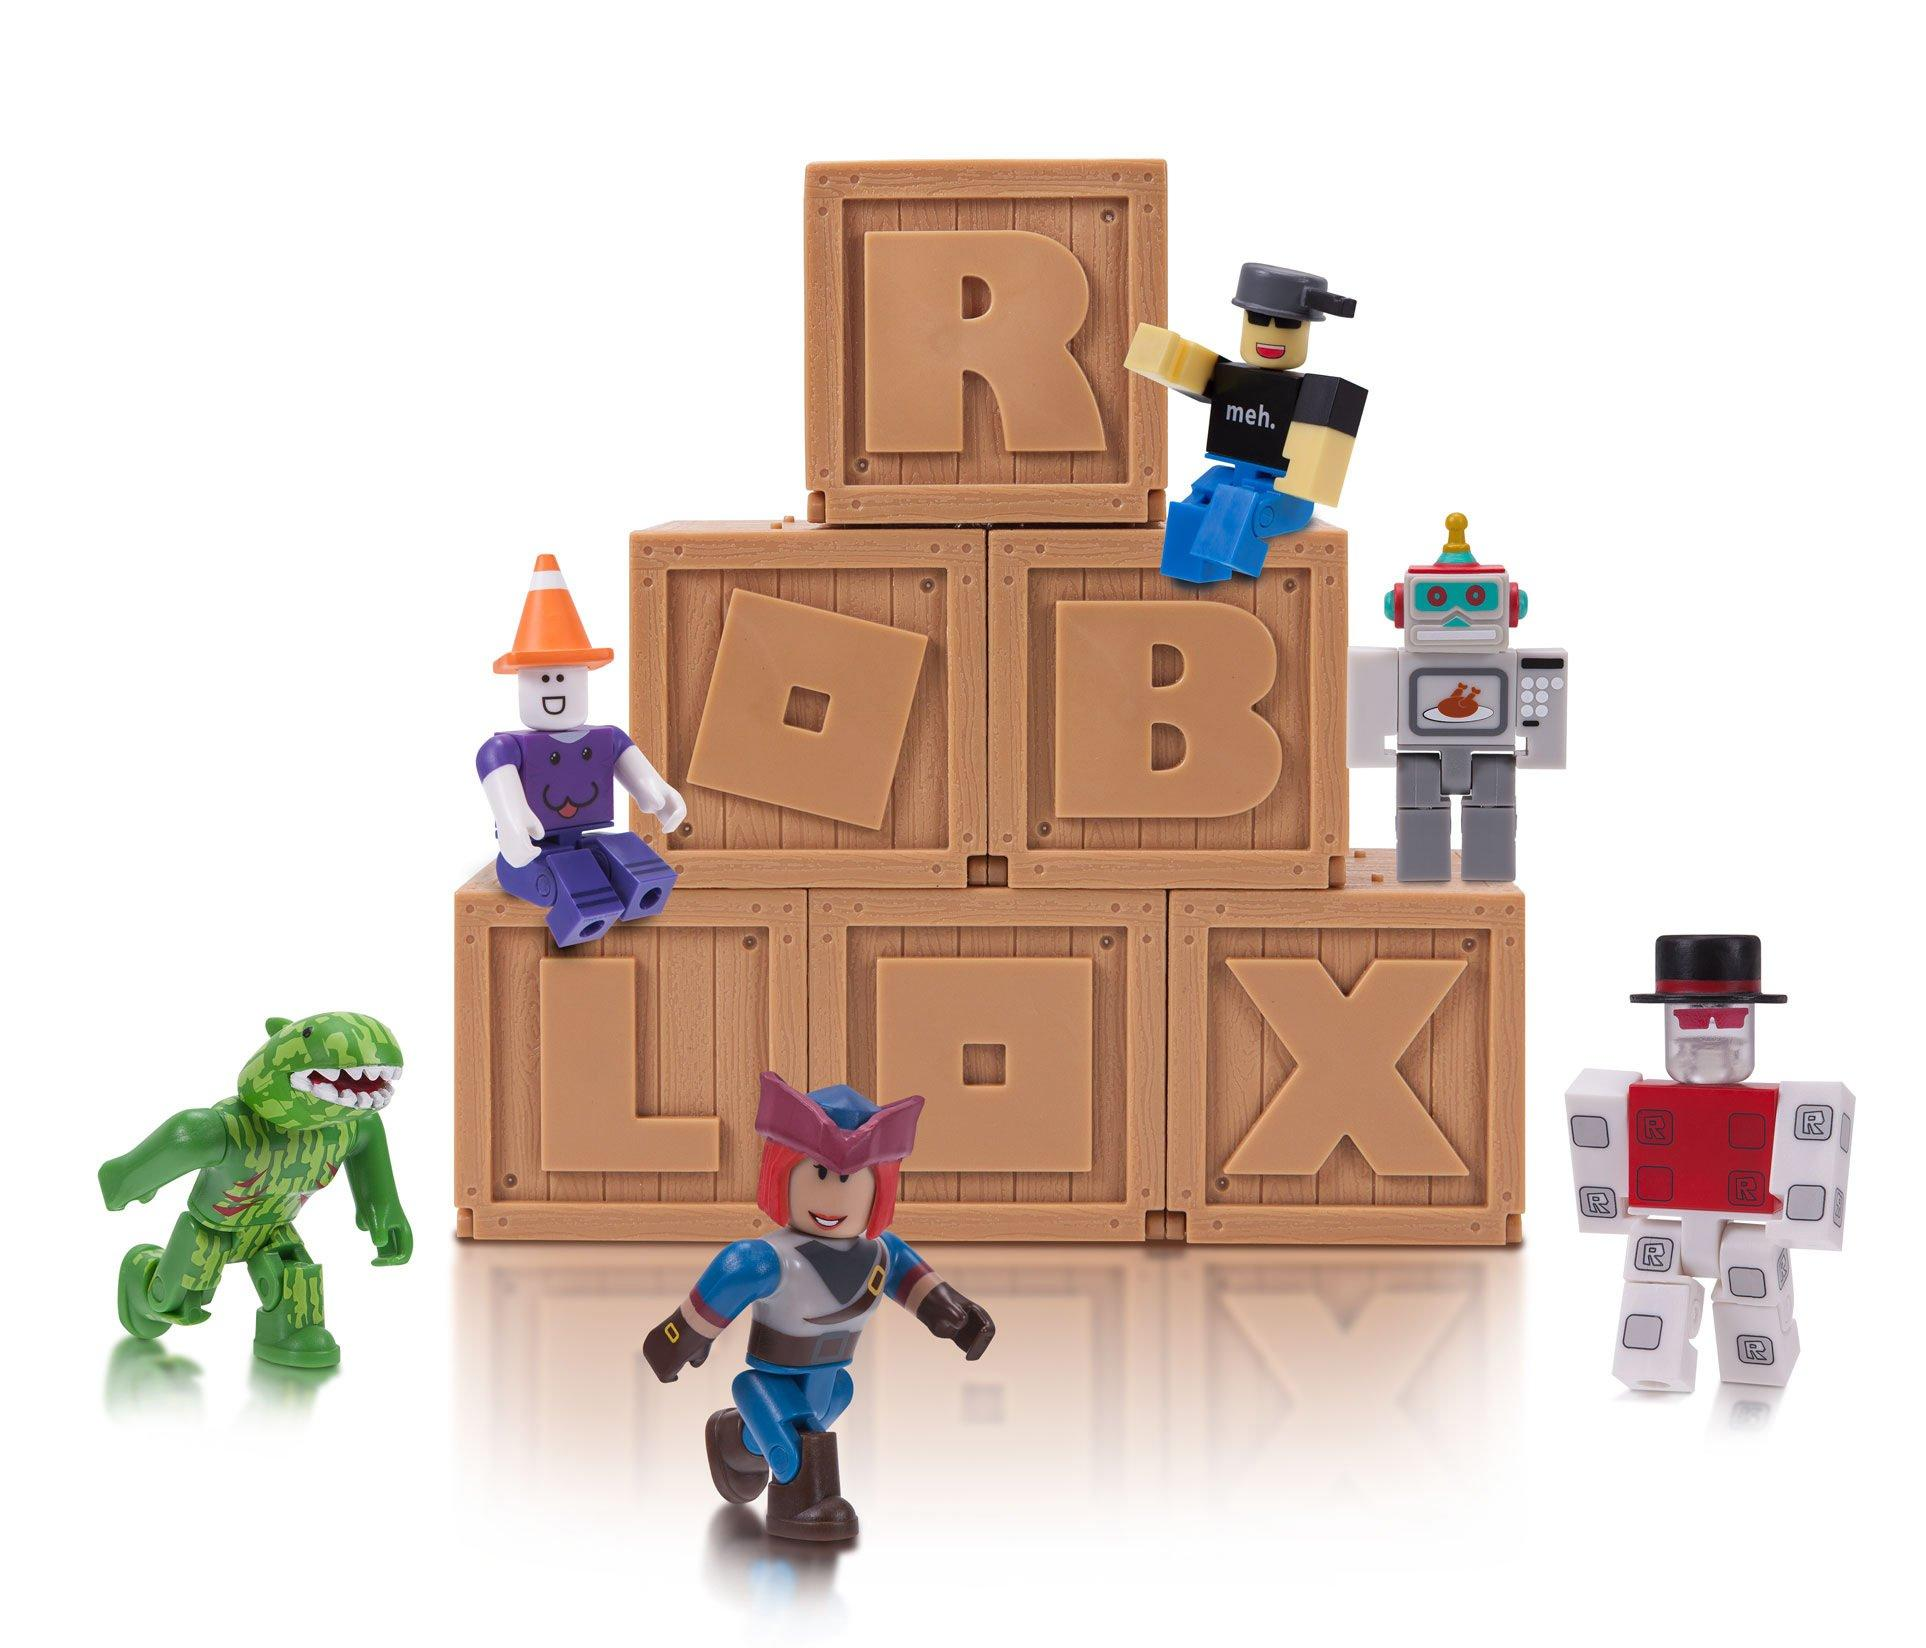 Roblox Online Building Toy Roblox Series 2 Blind Box Figure Gamestop